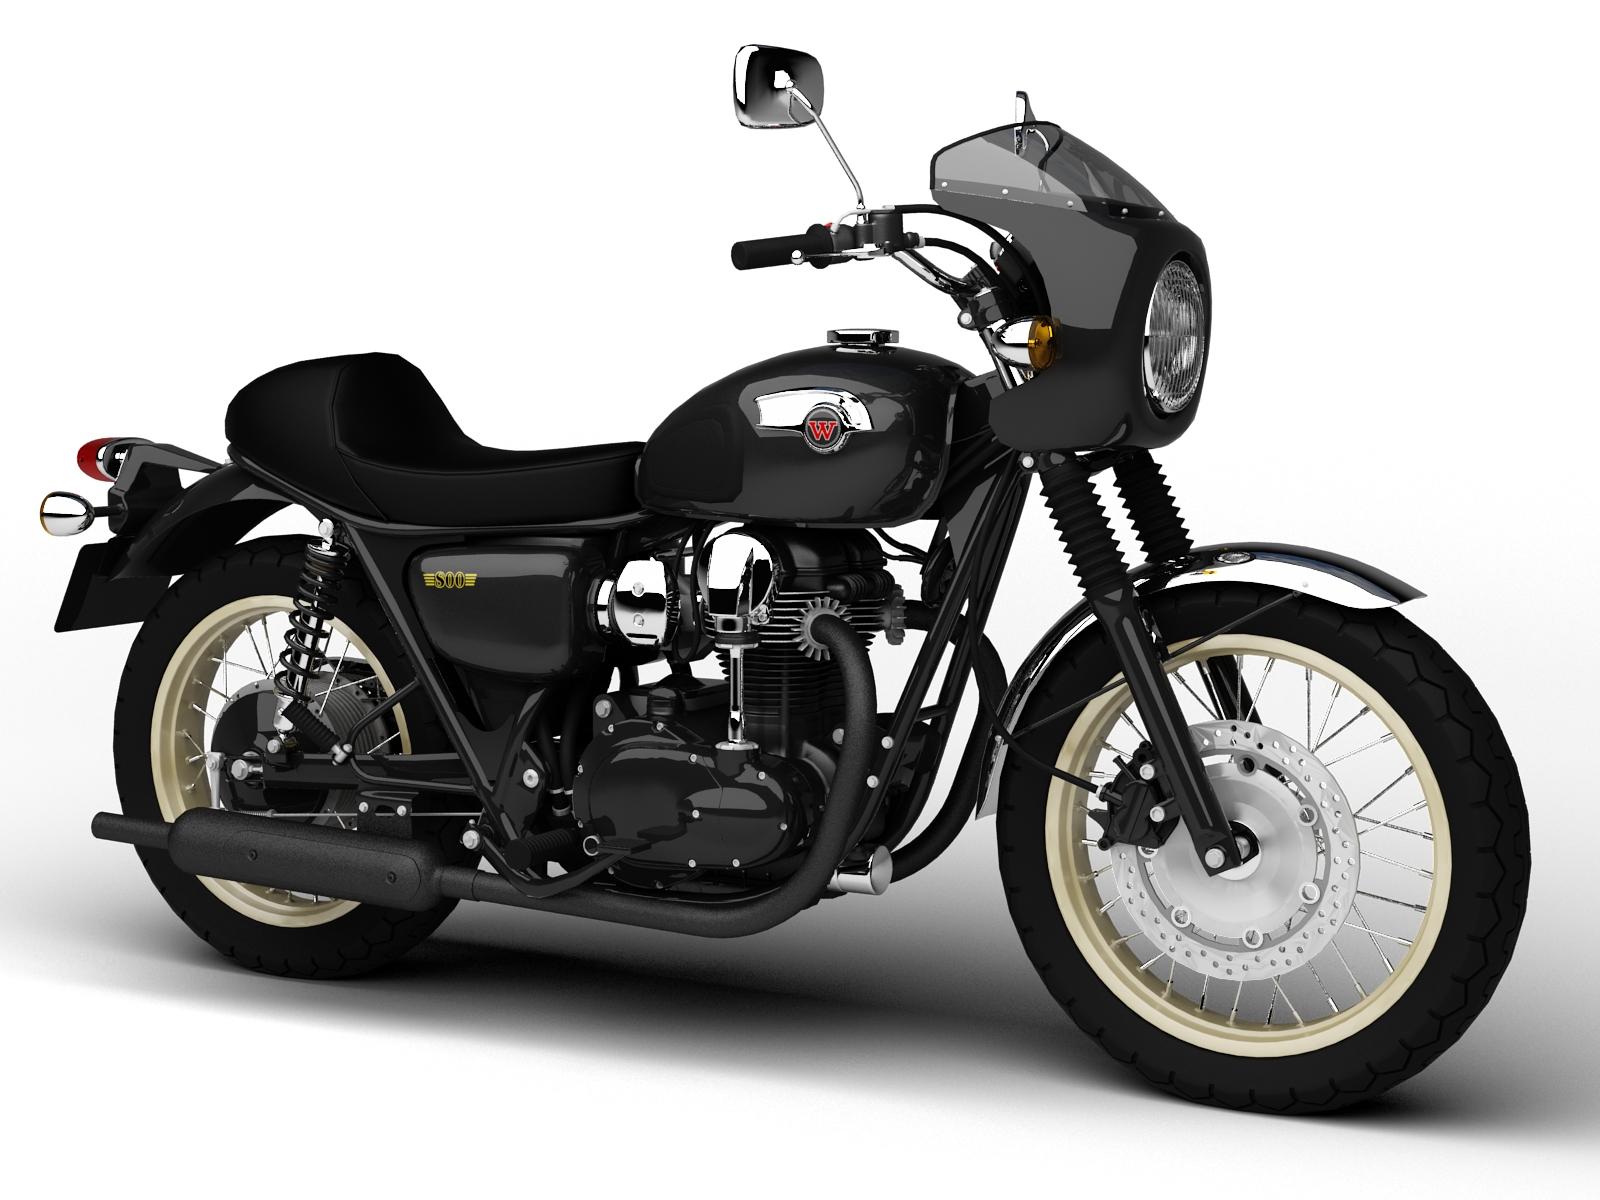 Kawasaki W800 CRS 2014 3d model 3ds max dxf fbx c4d obj 213655